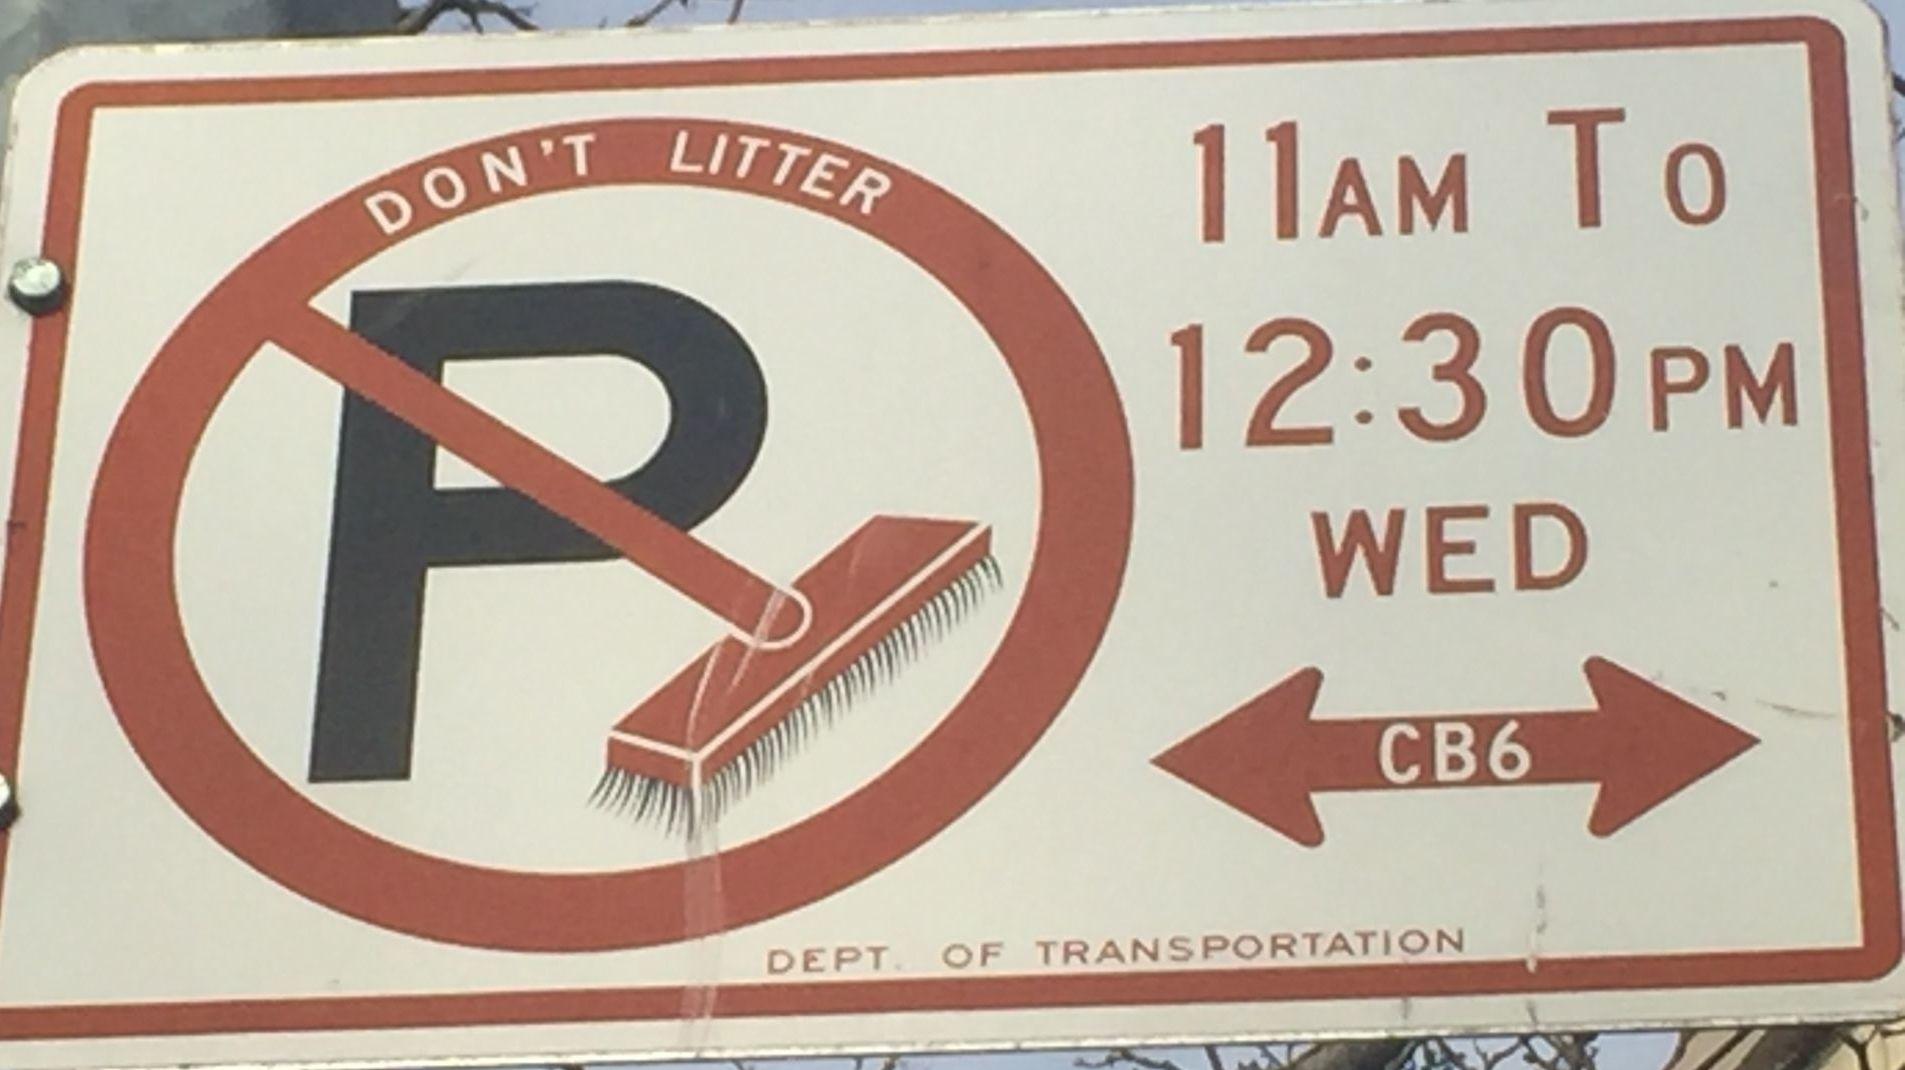 Holidays That Suspend Alternate Side Parking In Nyc in Nyc Parking Map Alternate Side